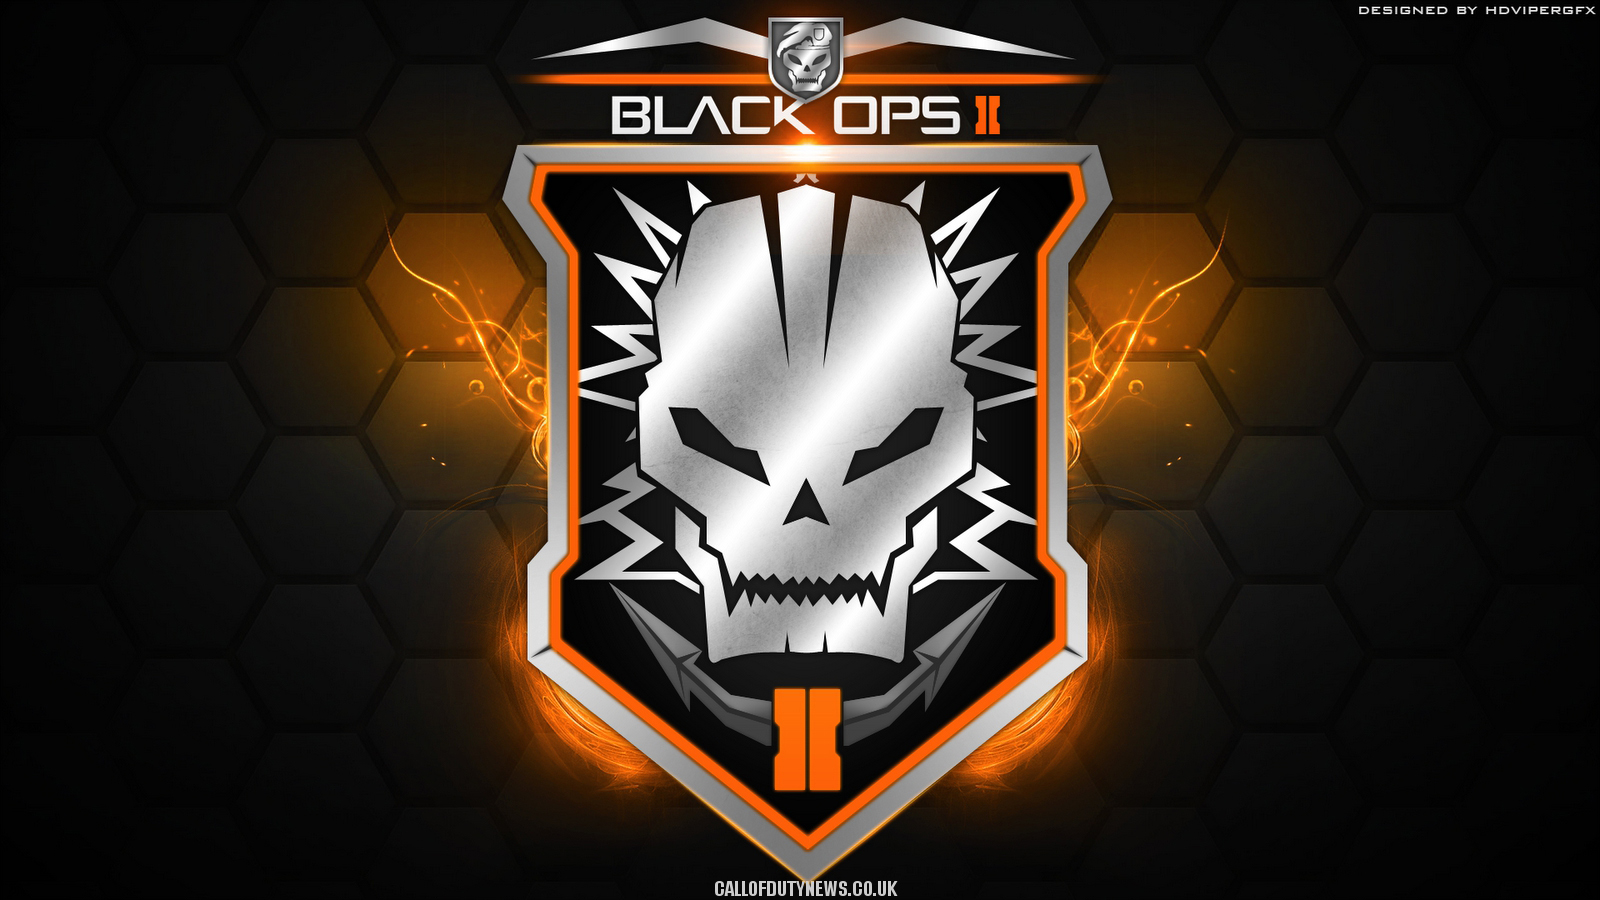 Call Of Duty Bo2 Wallpaper: Black Ops 3 Logo Wallpaper